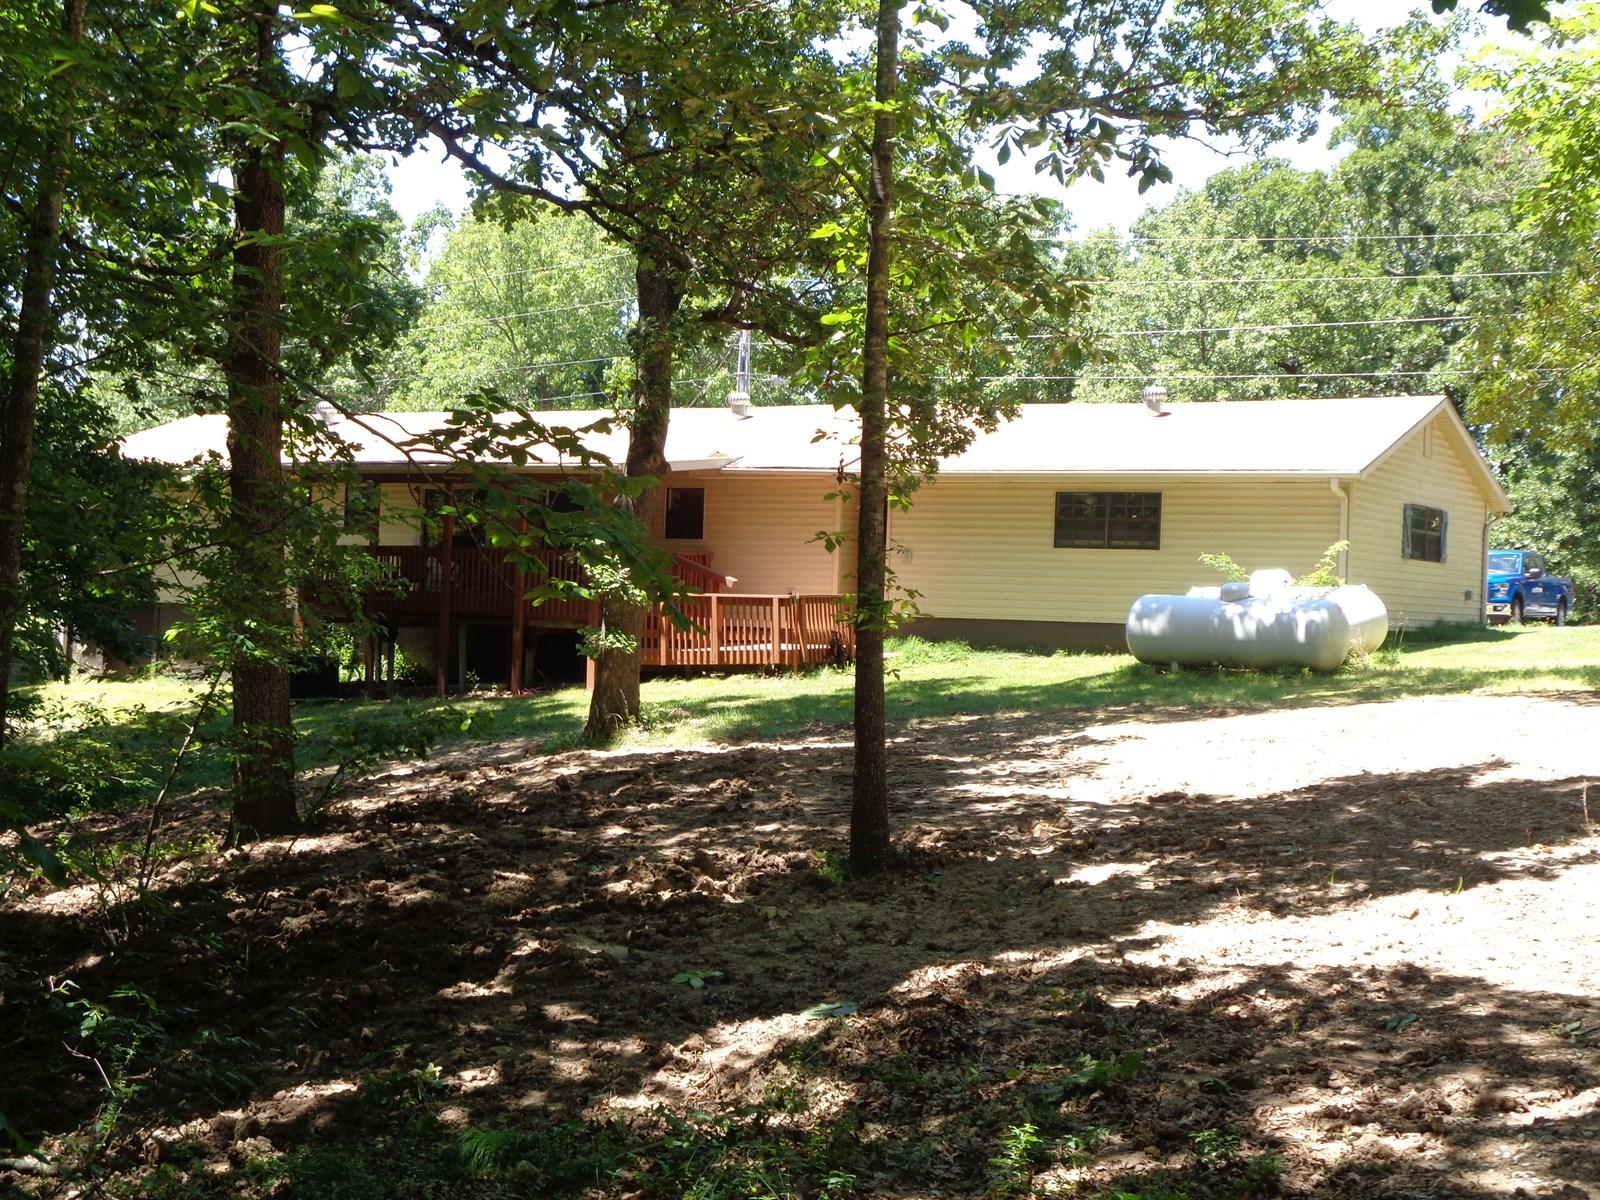 Fayetteville, Arkansas, 1646 sq ft Home& 5.91 Acres For Sale